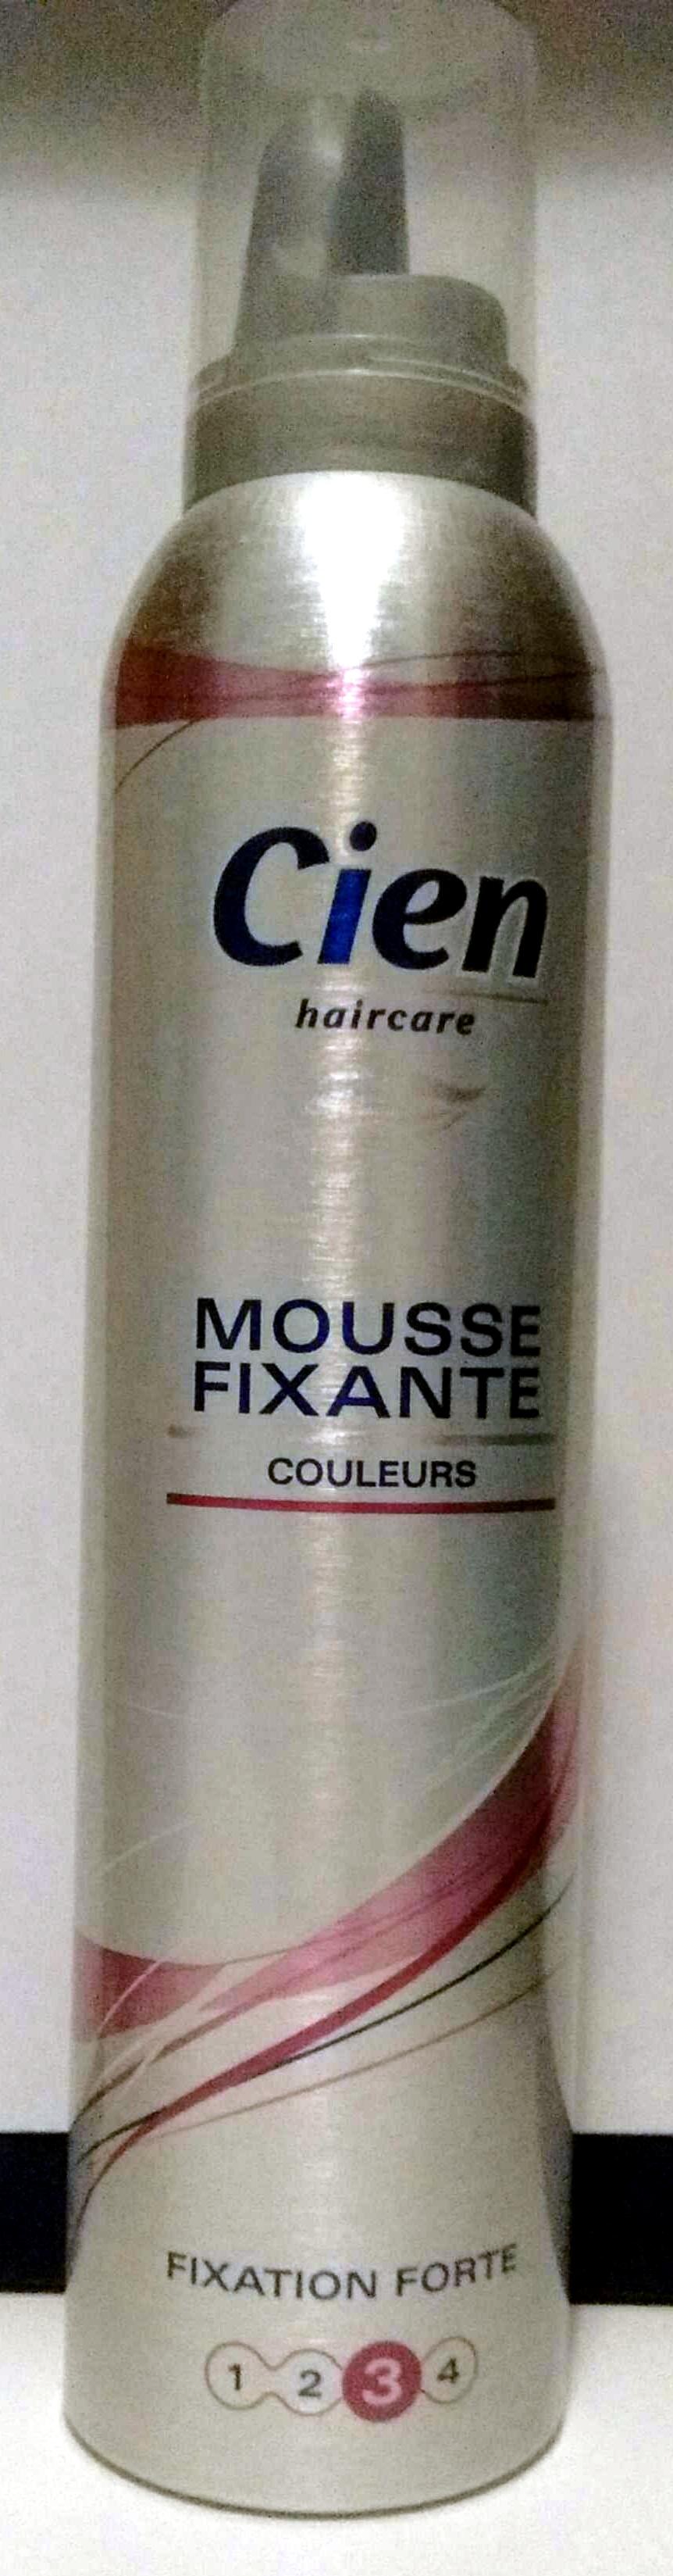 Mousse Fixante Couleurs Fixation Forte - Product - fr